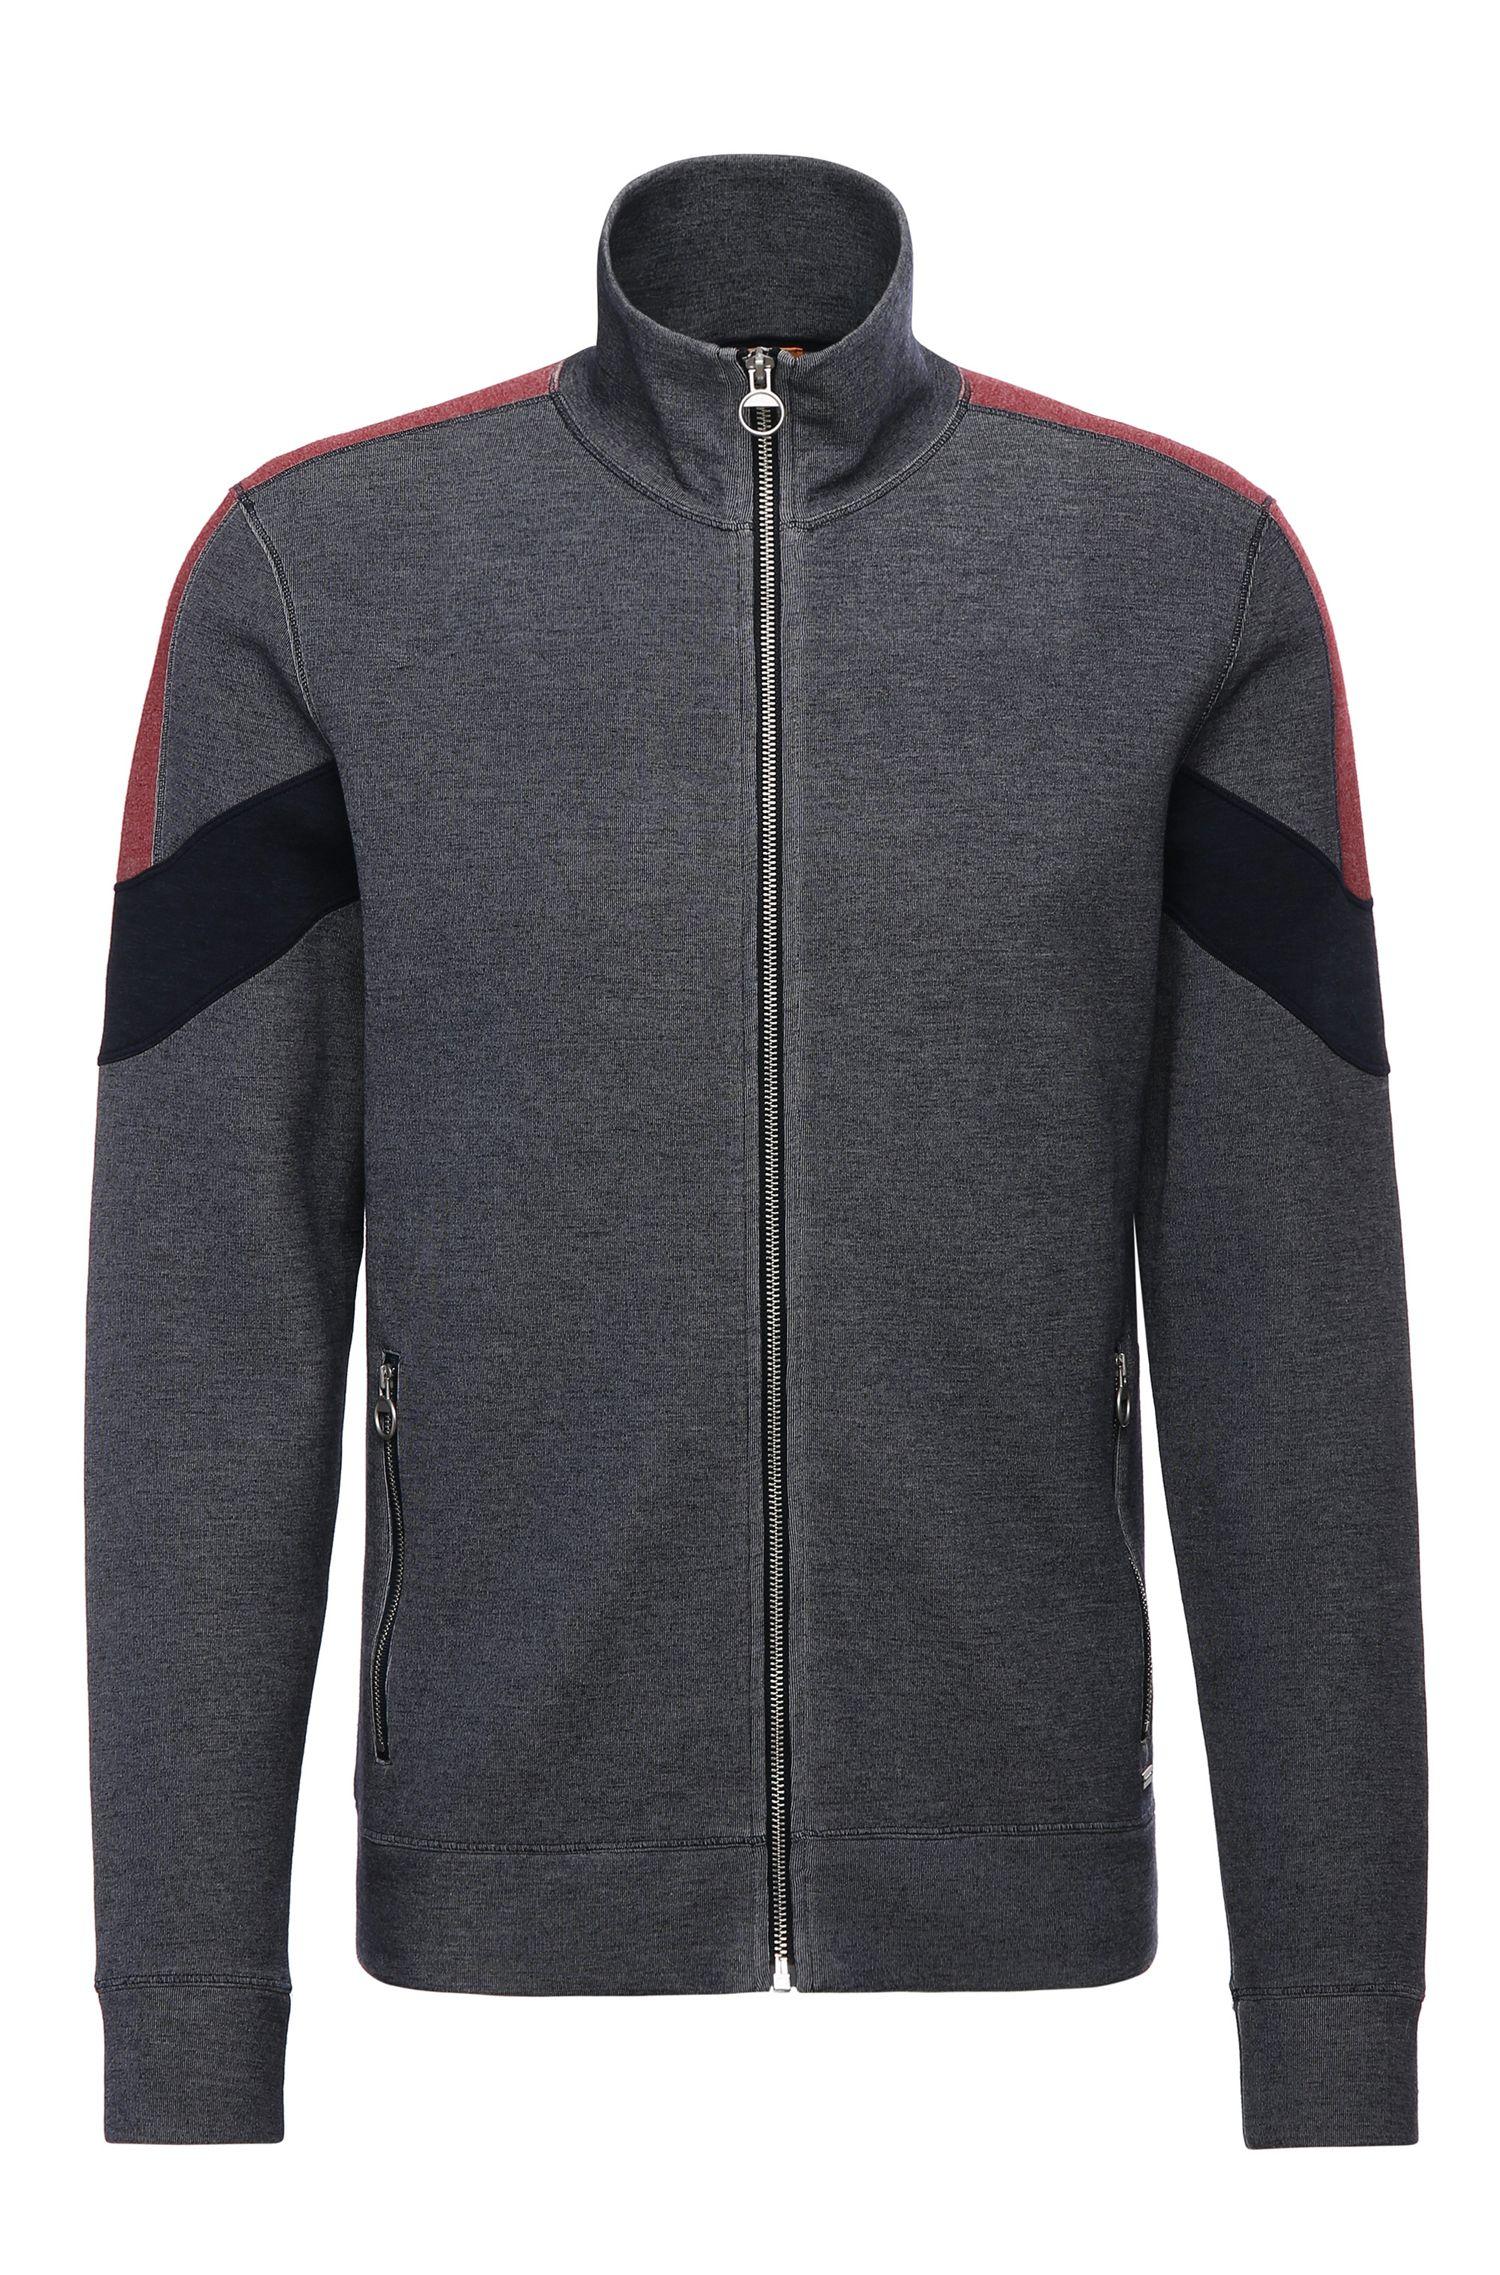 'Zycle' | Cotton Blend Indigo Zip Jacket